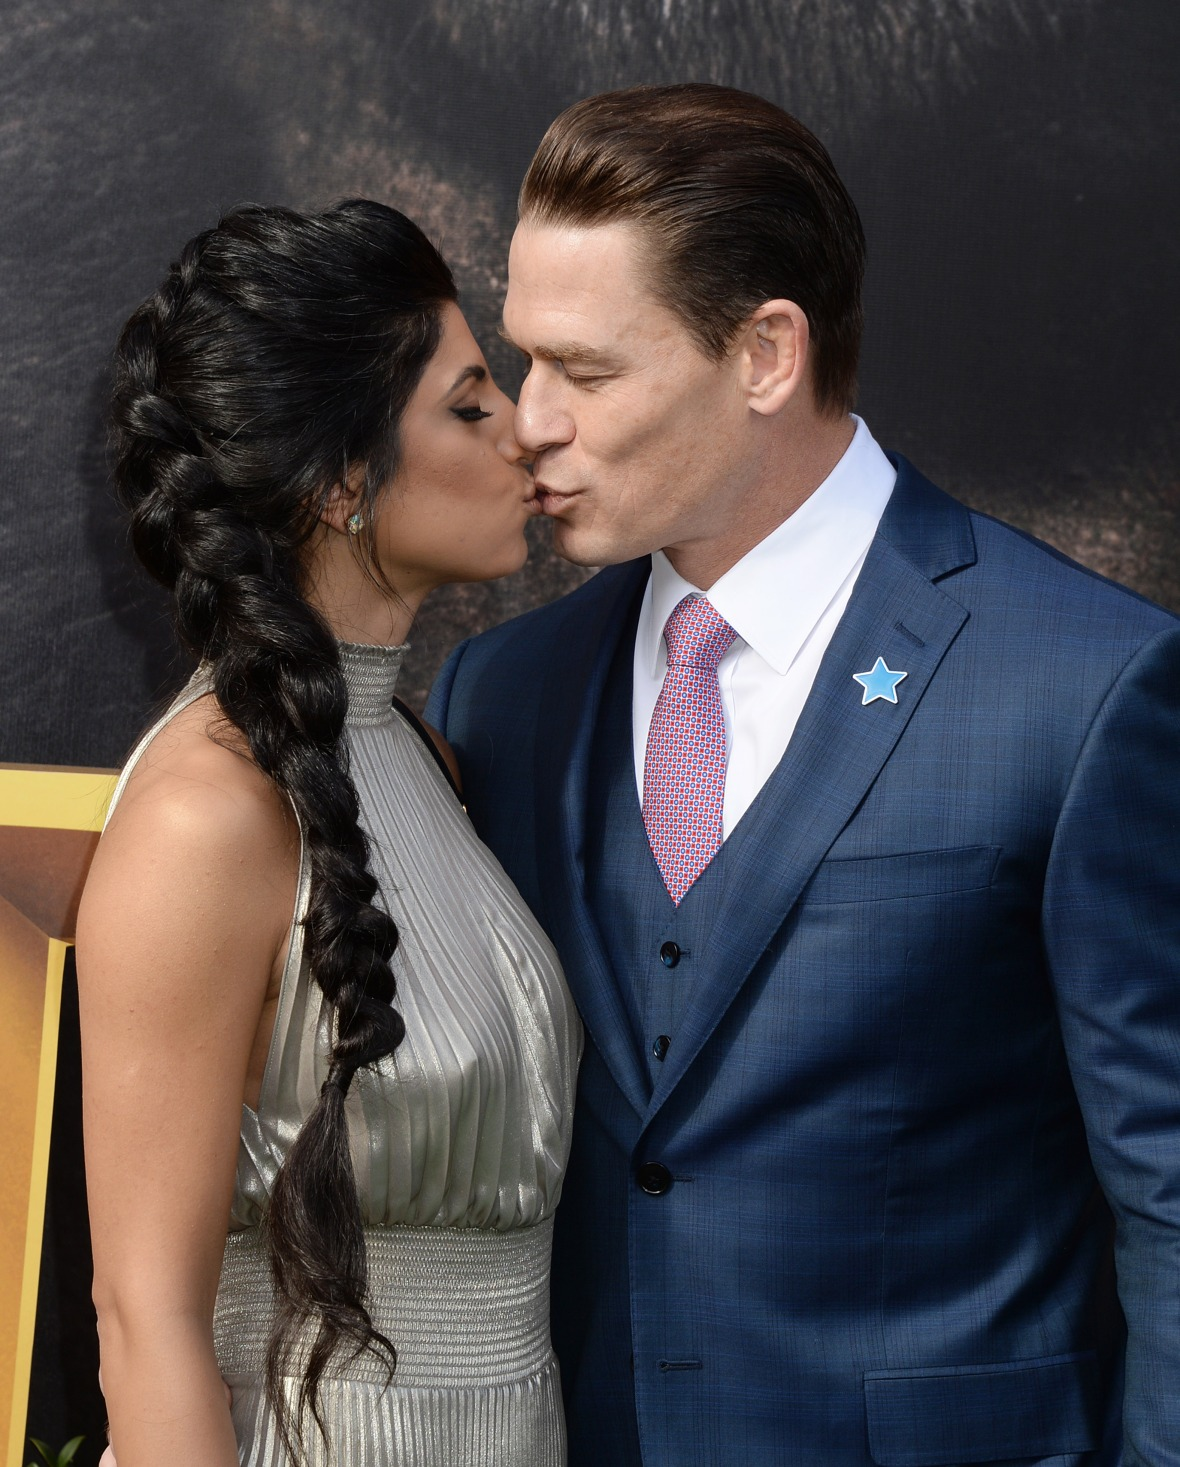 John Cena and Girlfriend Shay Shariatzadeh Kiss at Dolittle Premiere